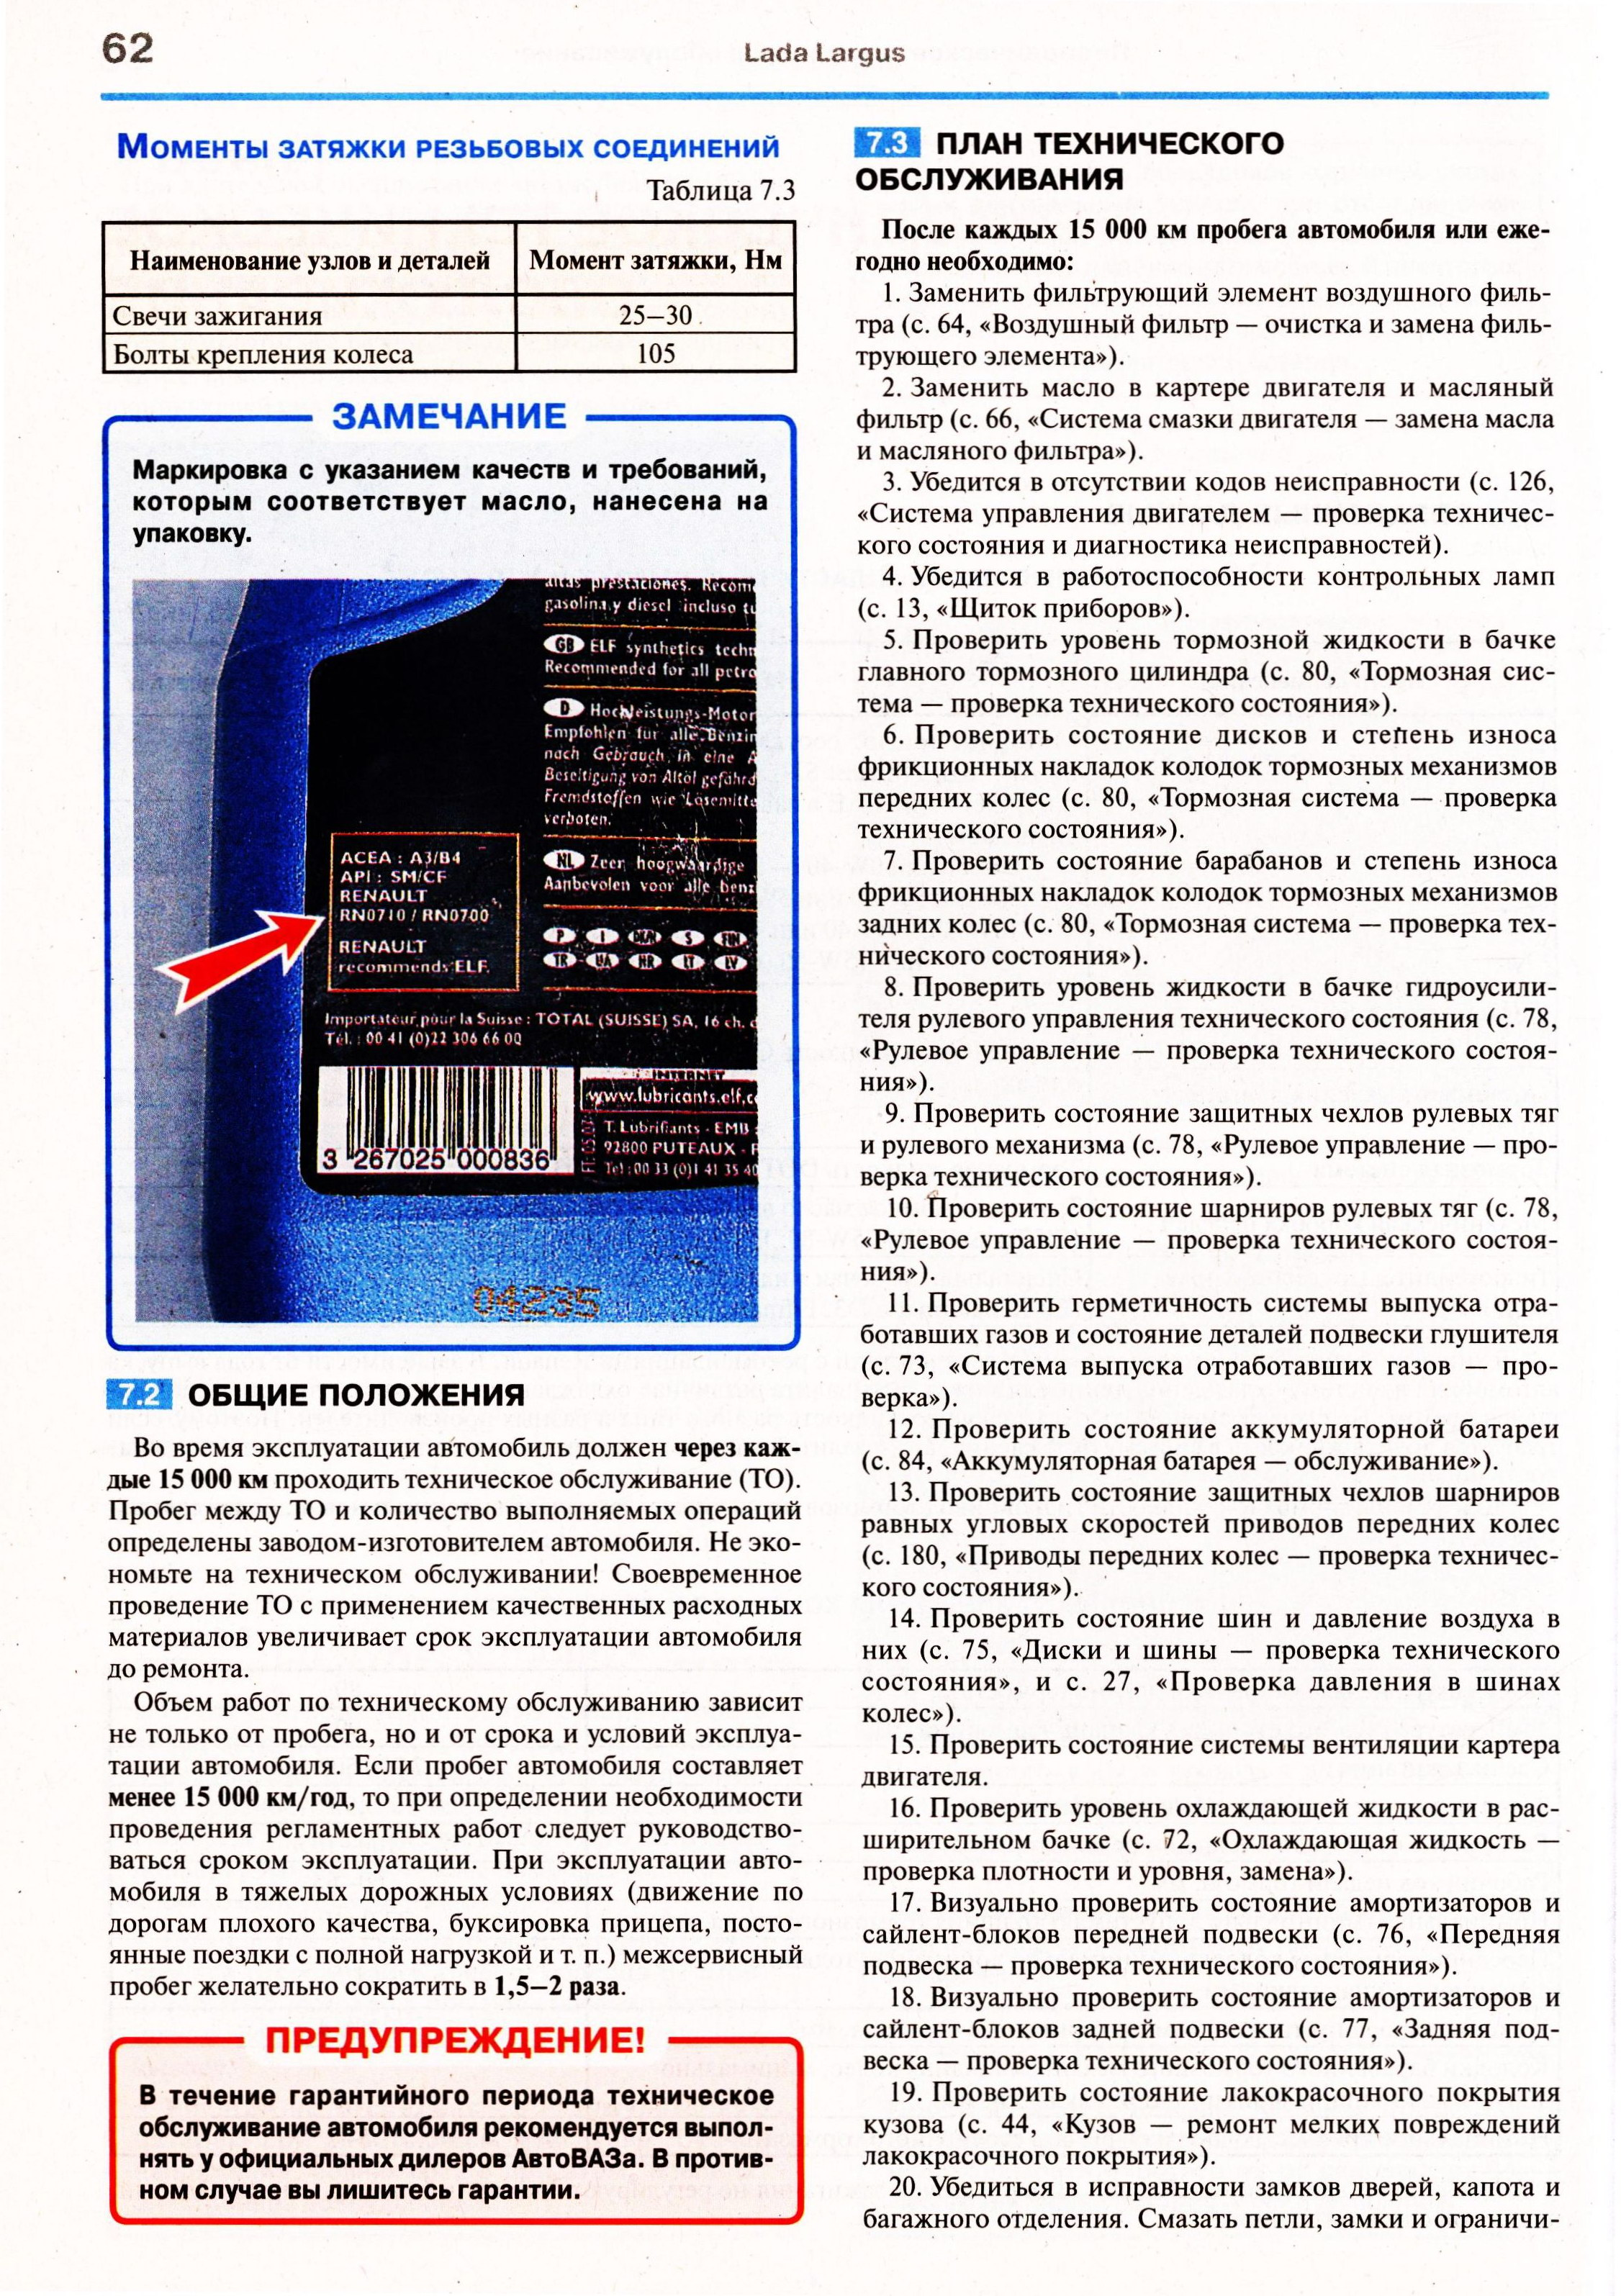 лада ларгус книга по ремонту и эксплуатации